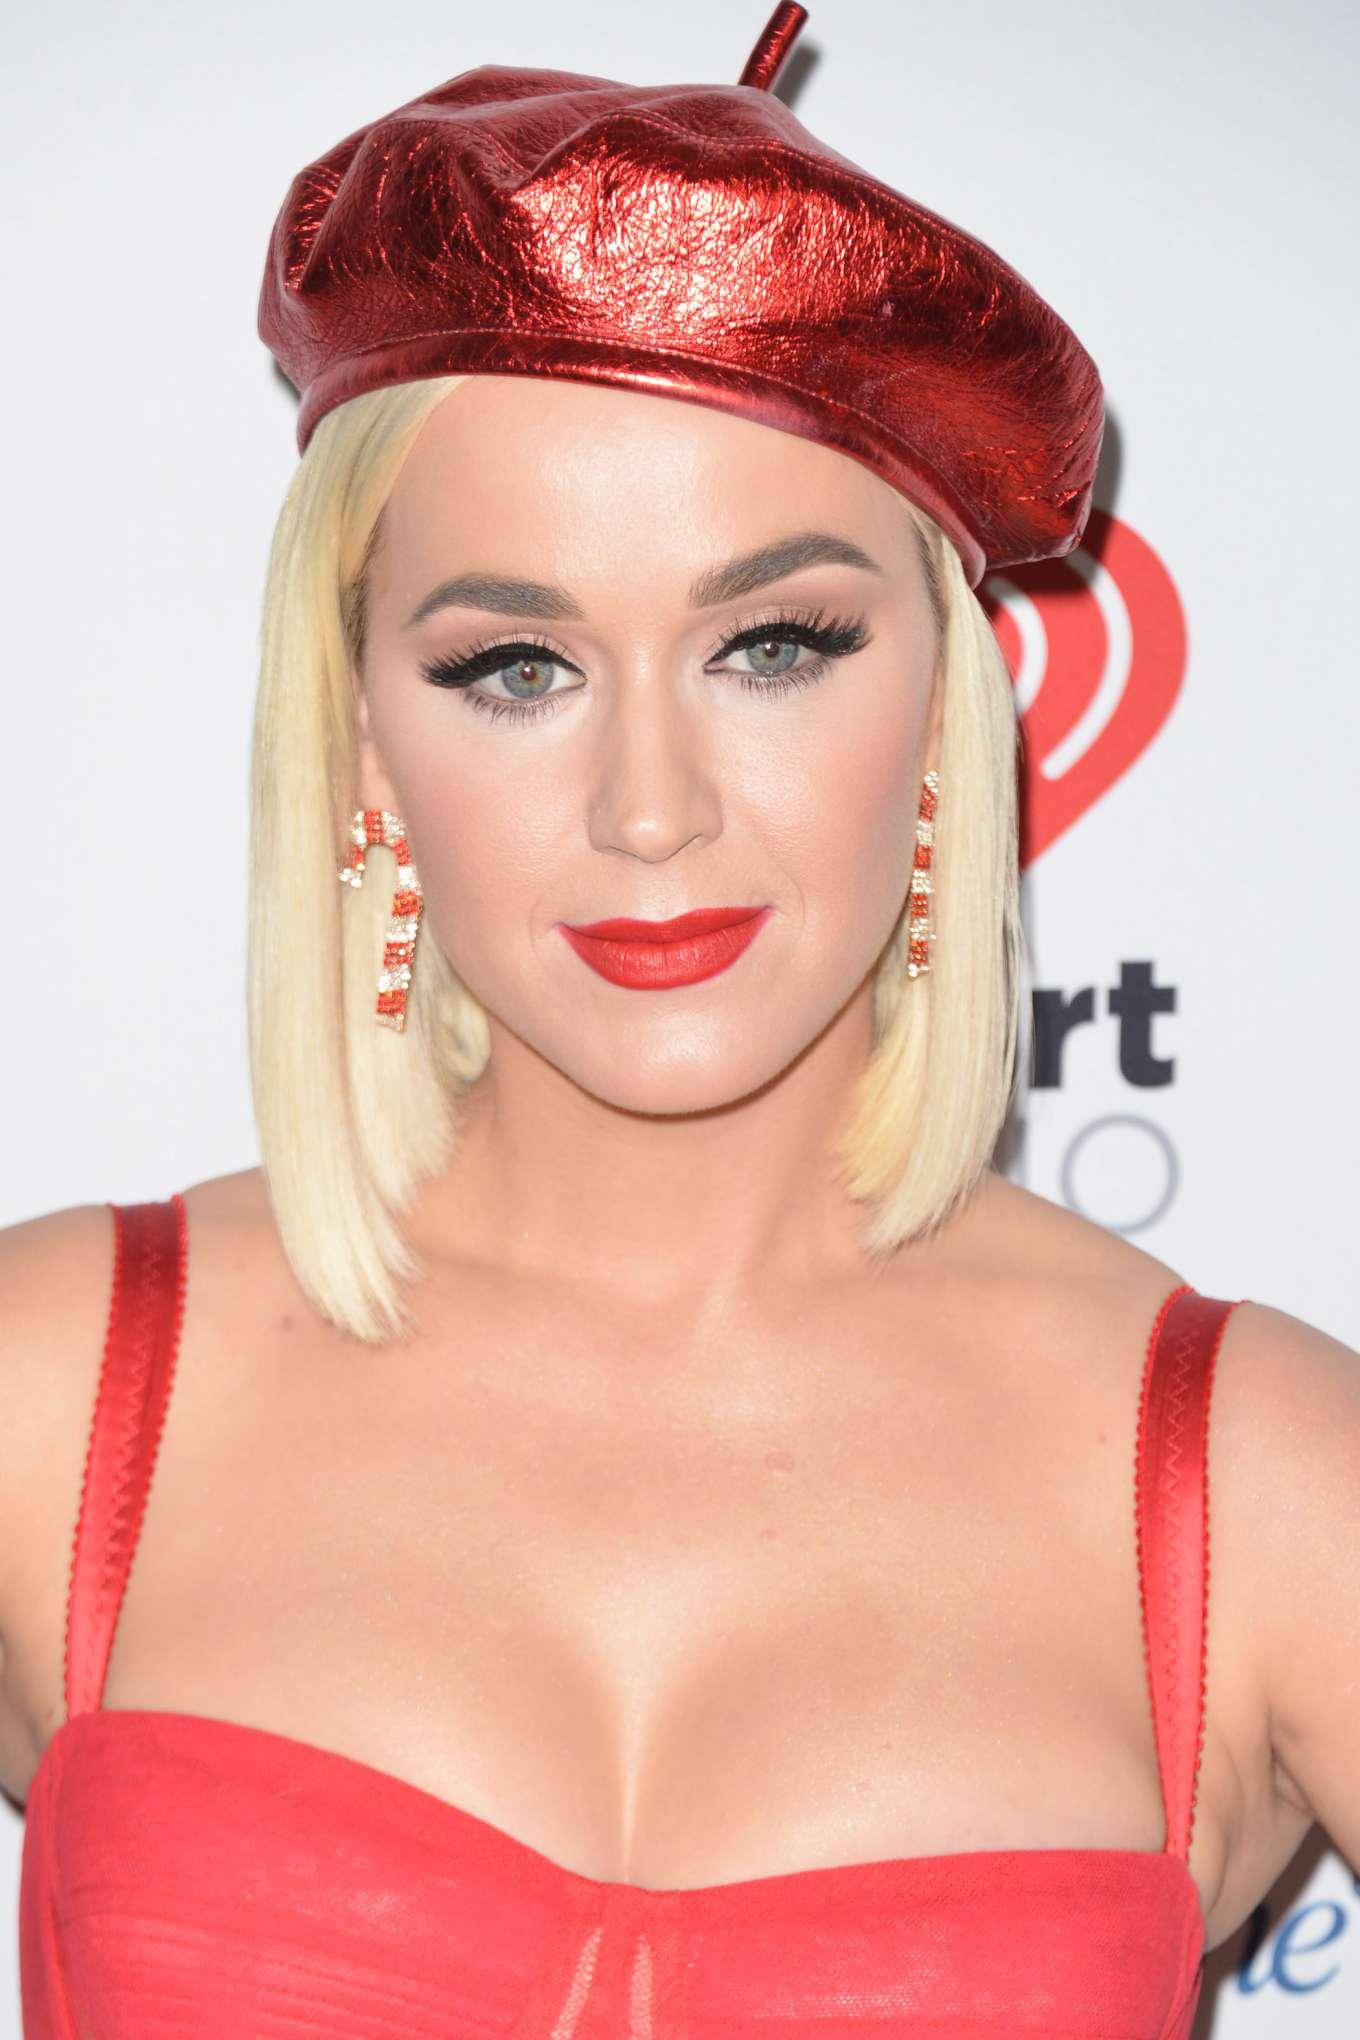 Katy Perry 2019 : Katy Perry – 2019 KIIS FMs iHeartRadio Jingle Ball-13